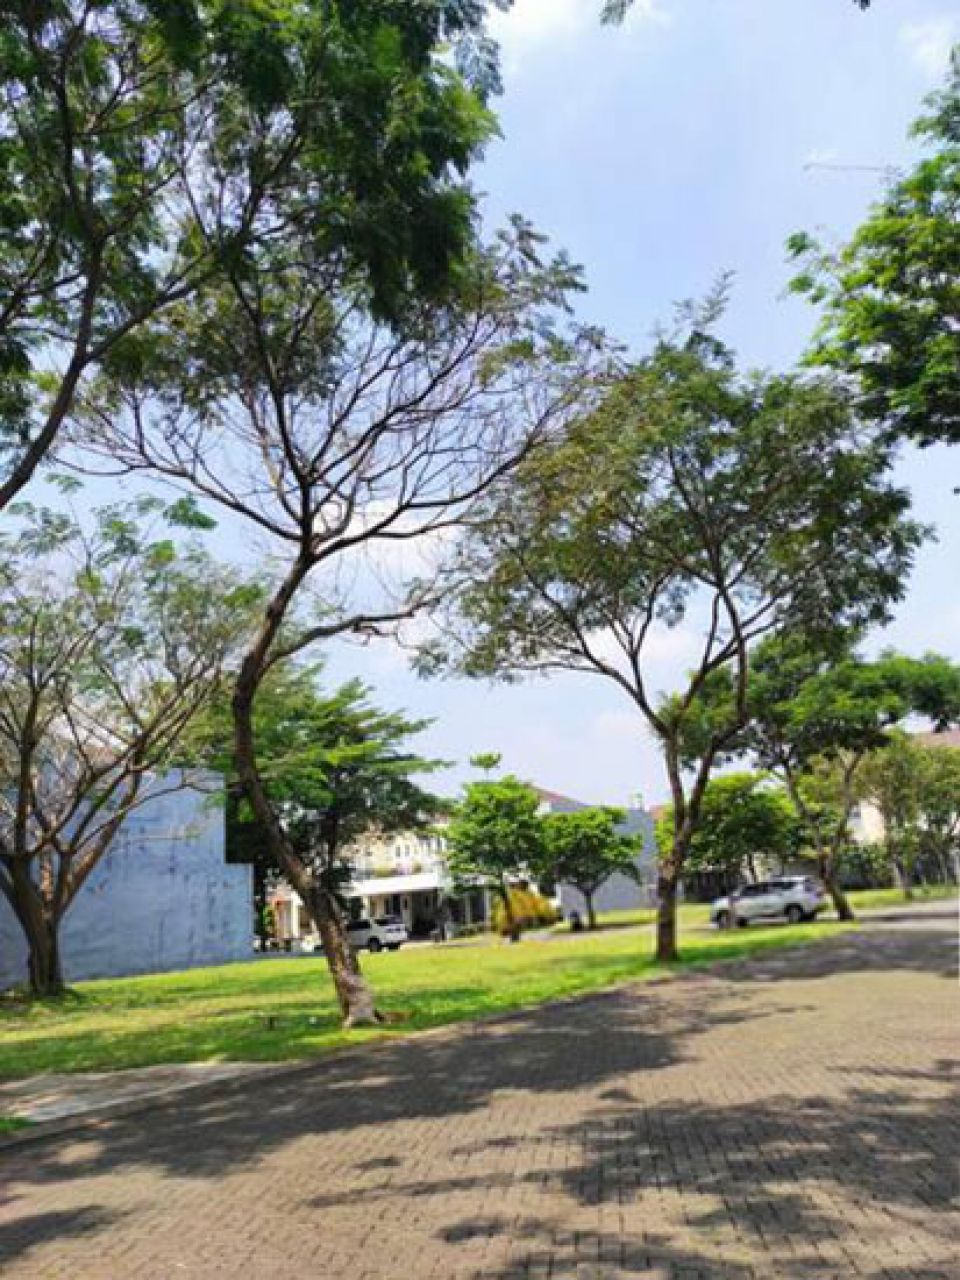 Plot Land at deFrangipani, dePark, BSD City, Banten